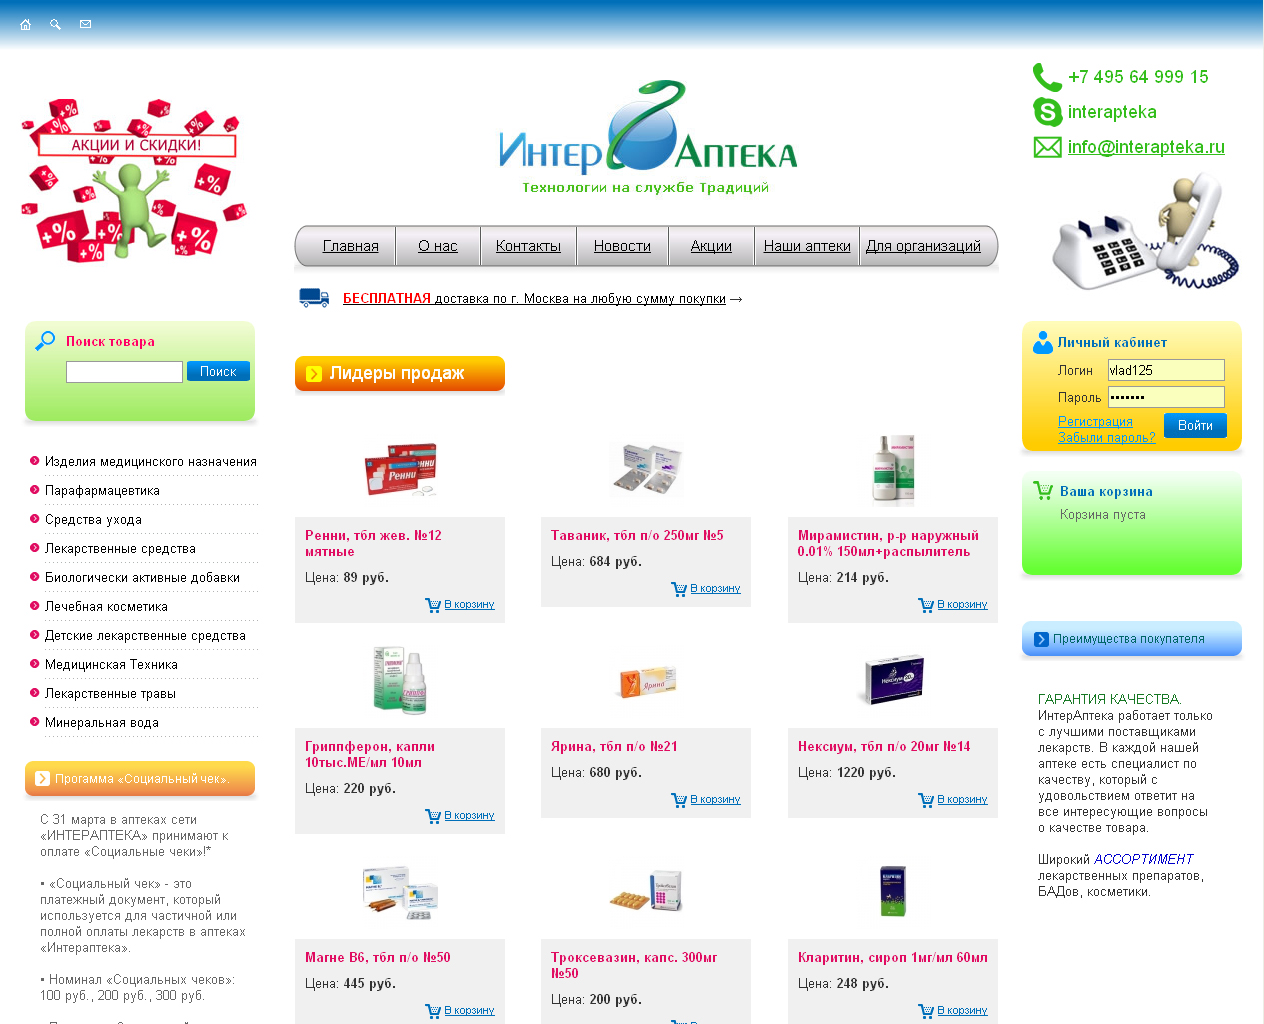 Интернет аптека Интераптека